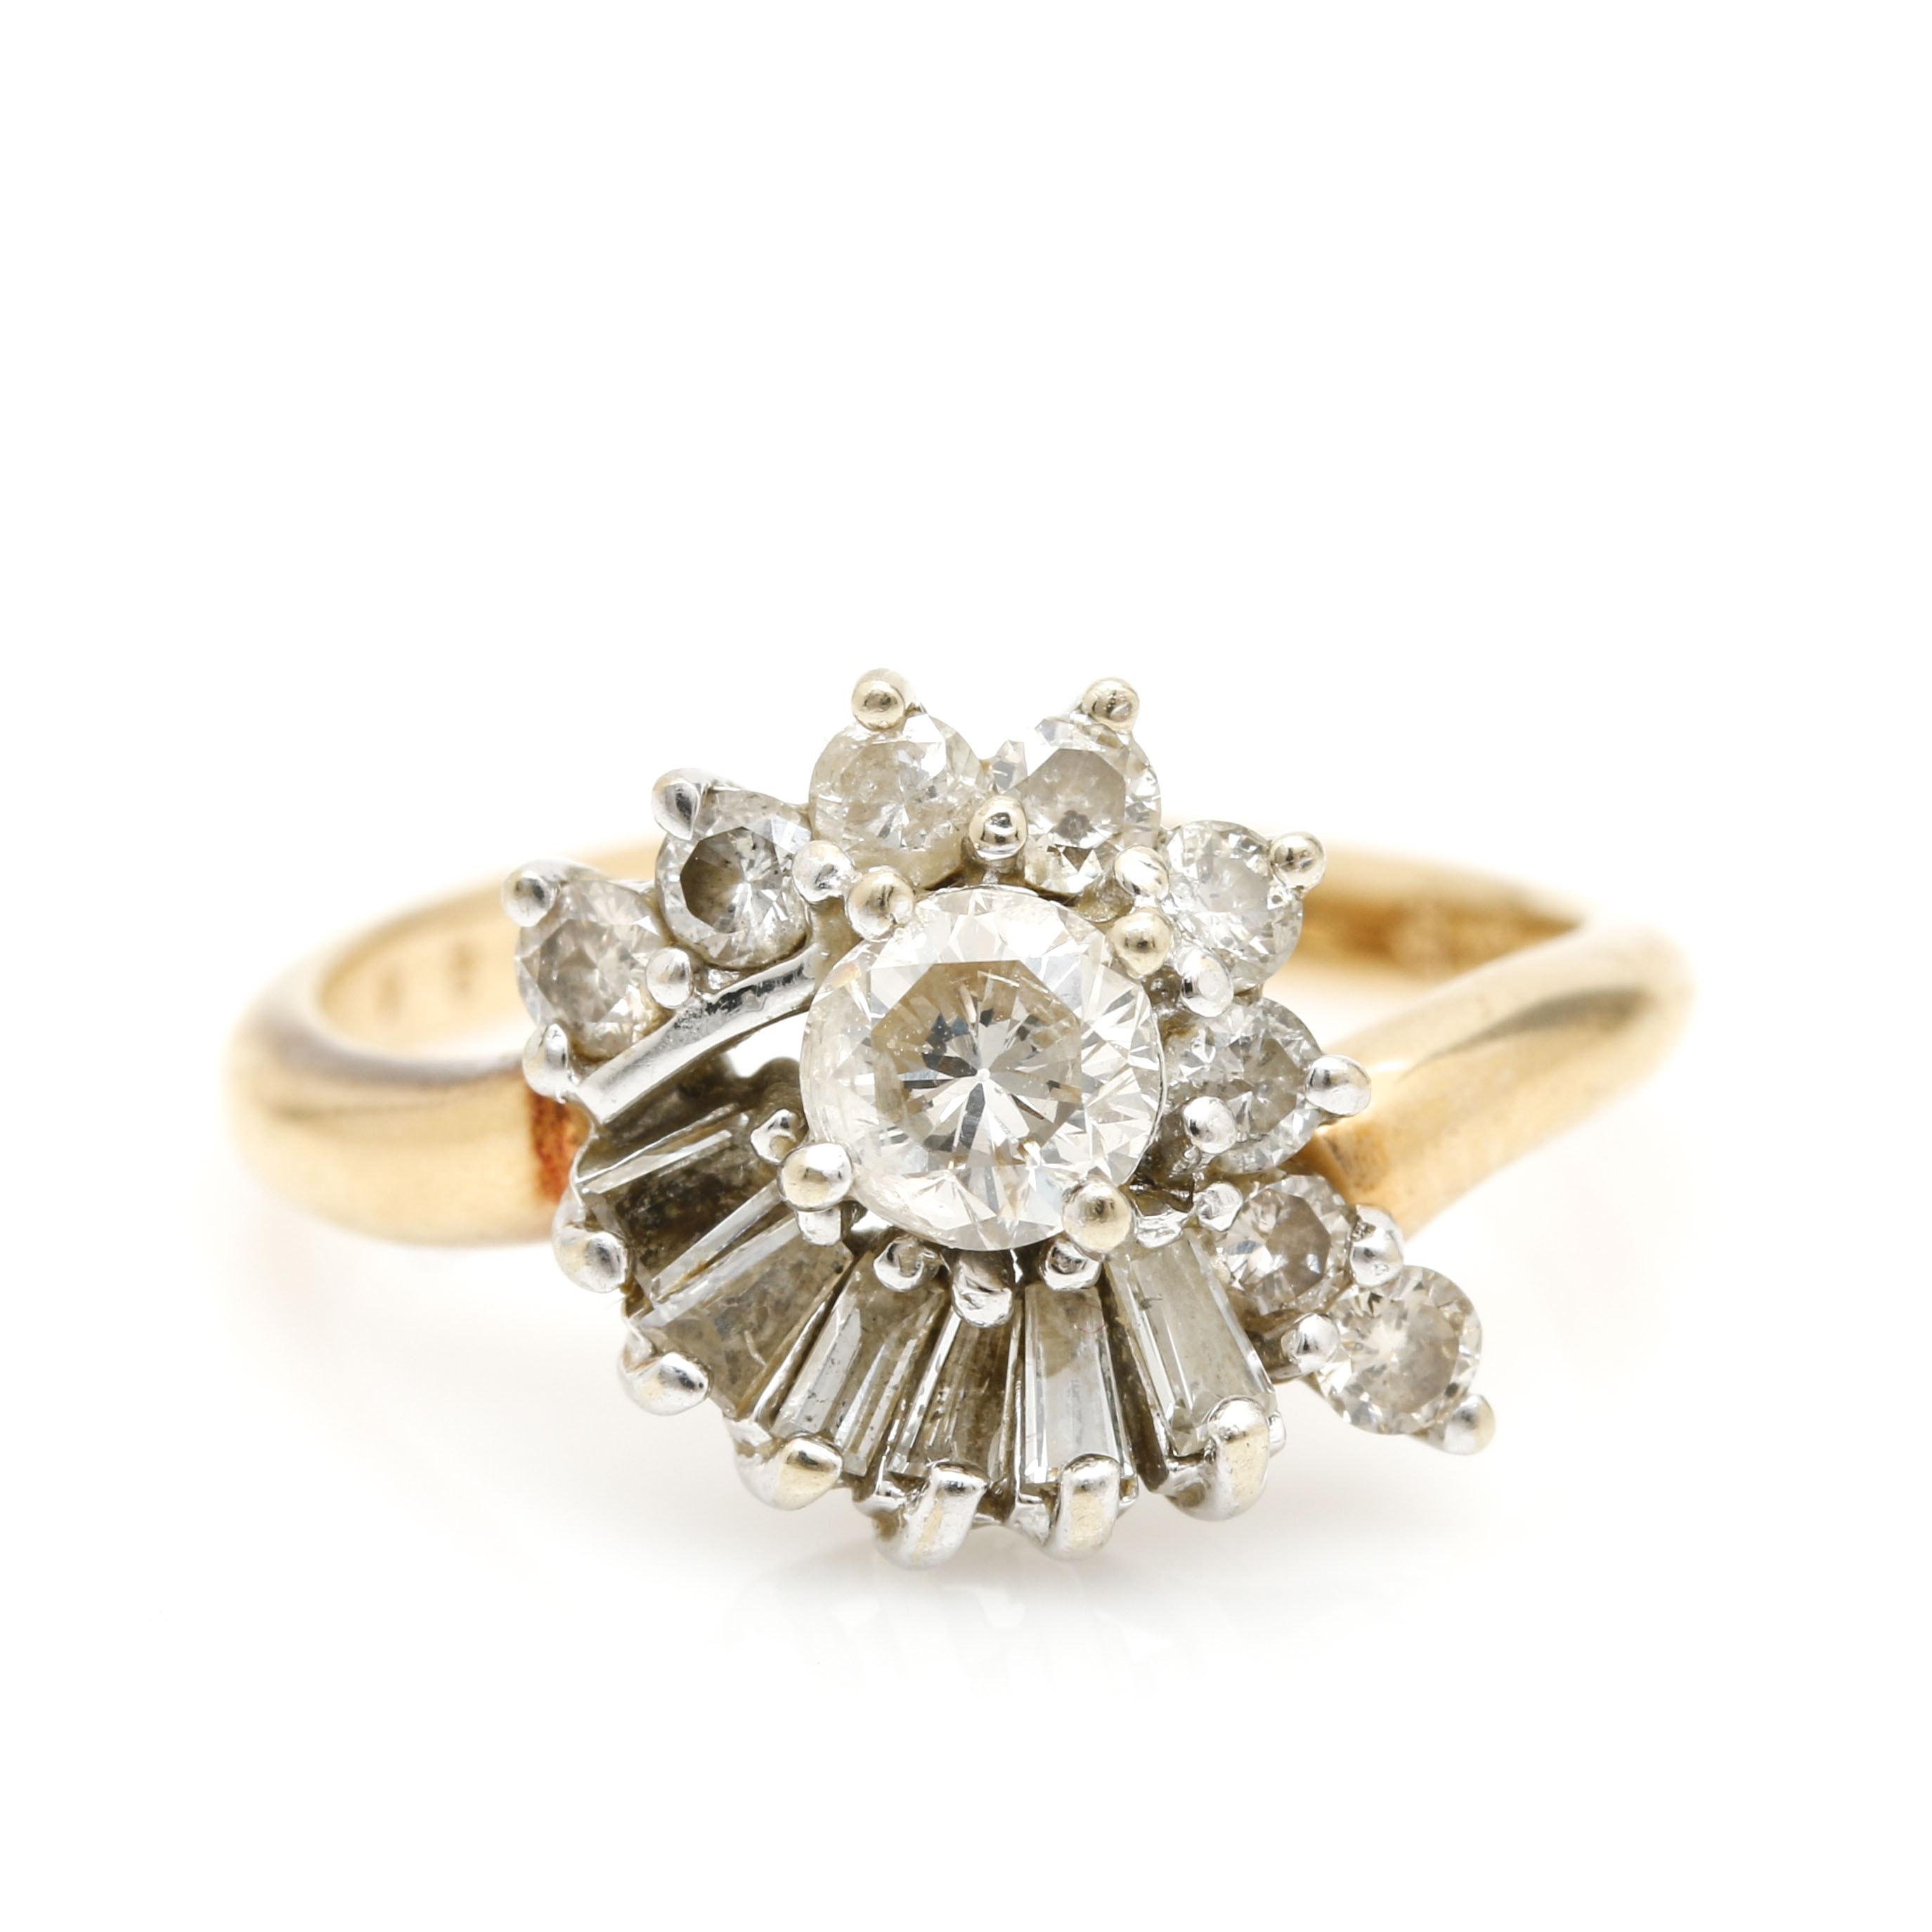 14K White and Yellow Gold 1.17 CTW Diamond Ring